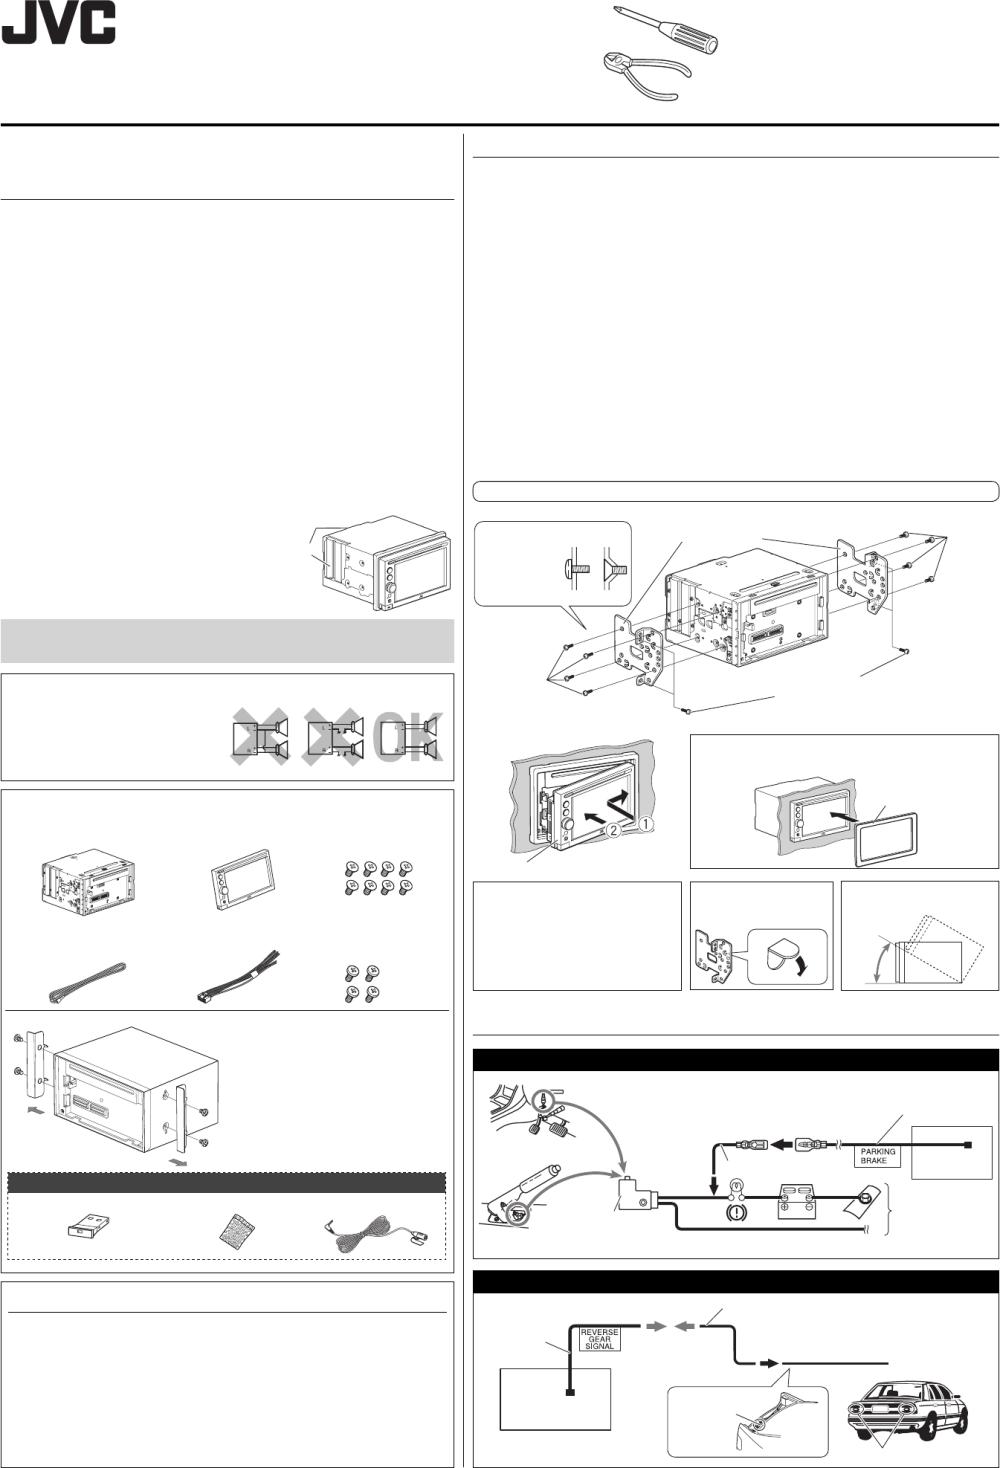 medium resolution of jvc kw xr610 wiring diagram the structural wiring diagram u2022jvc kw xr610 wiring diagram wiring